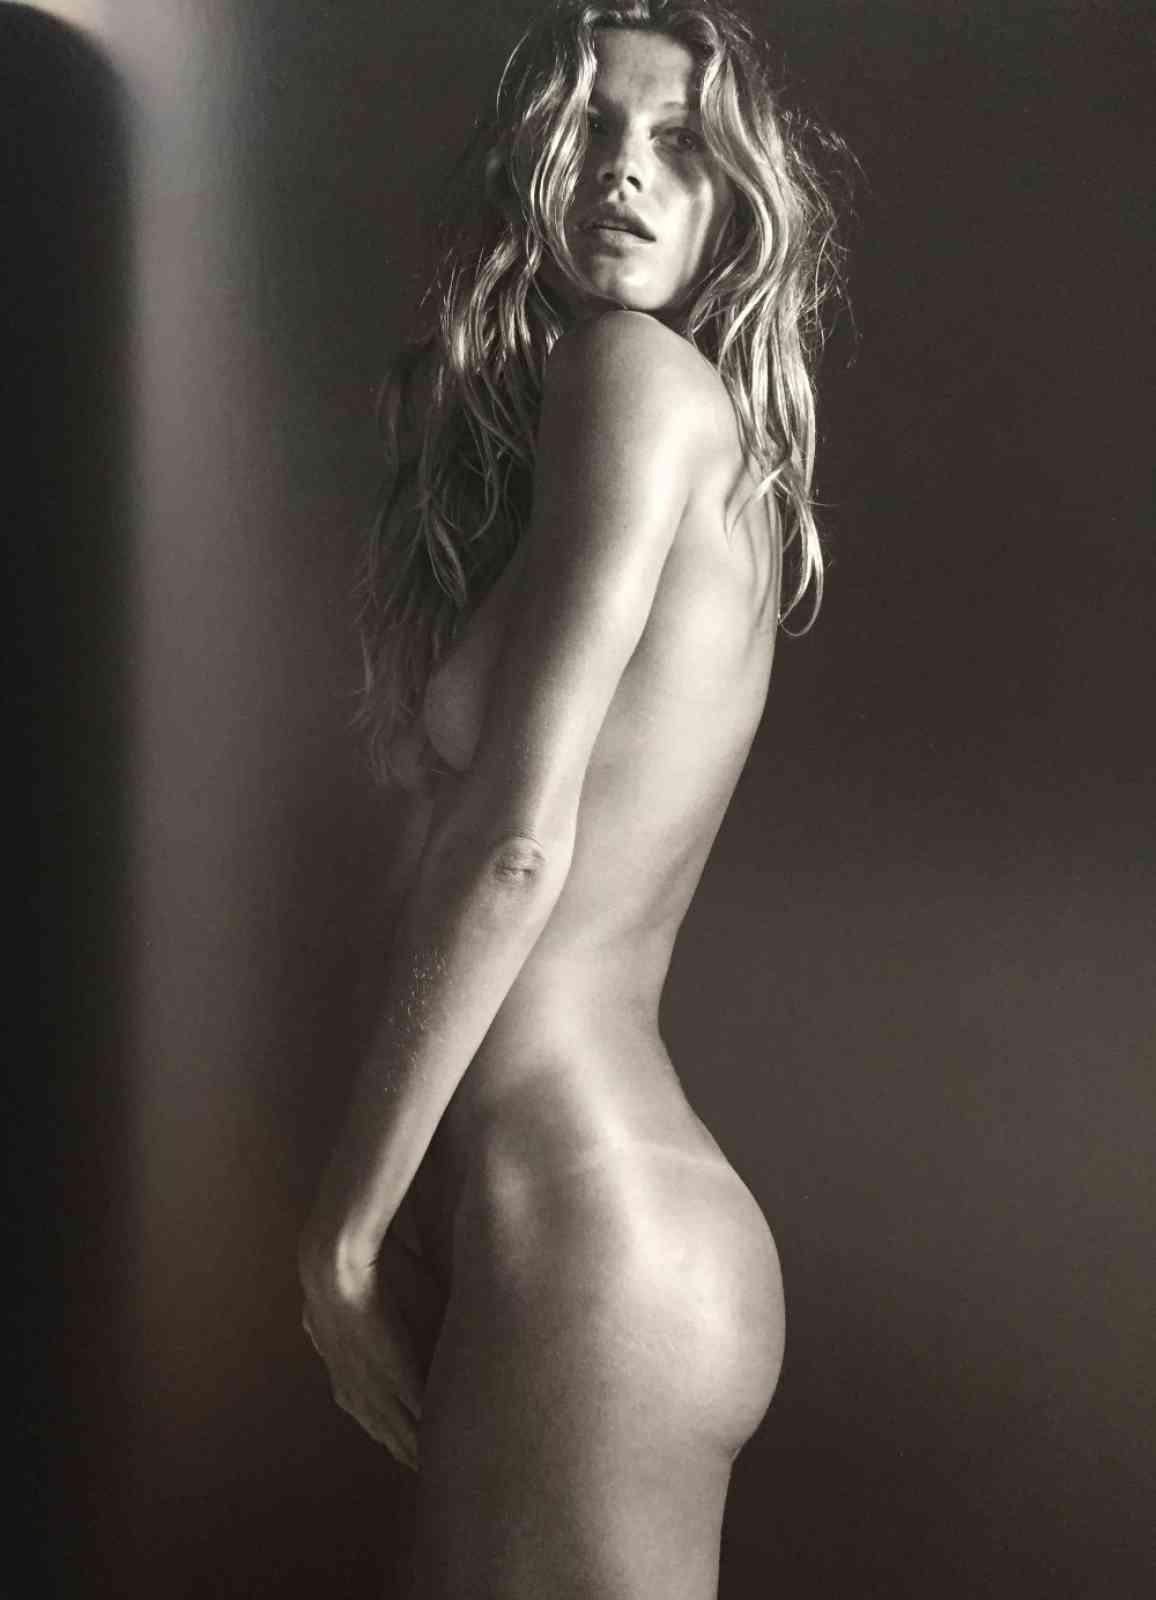 giselle bundchen nude photos